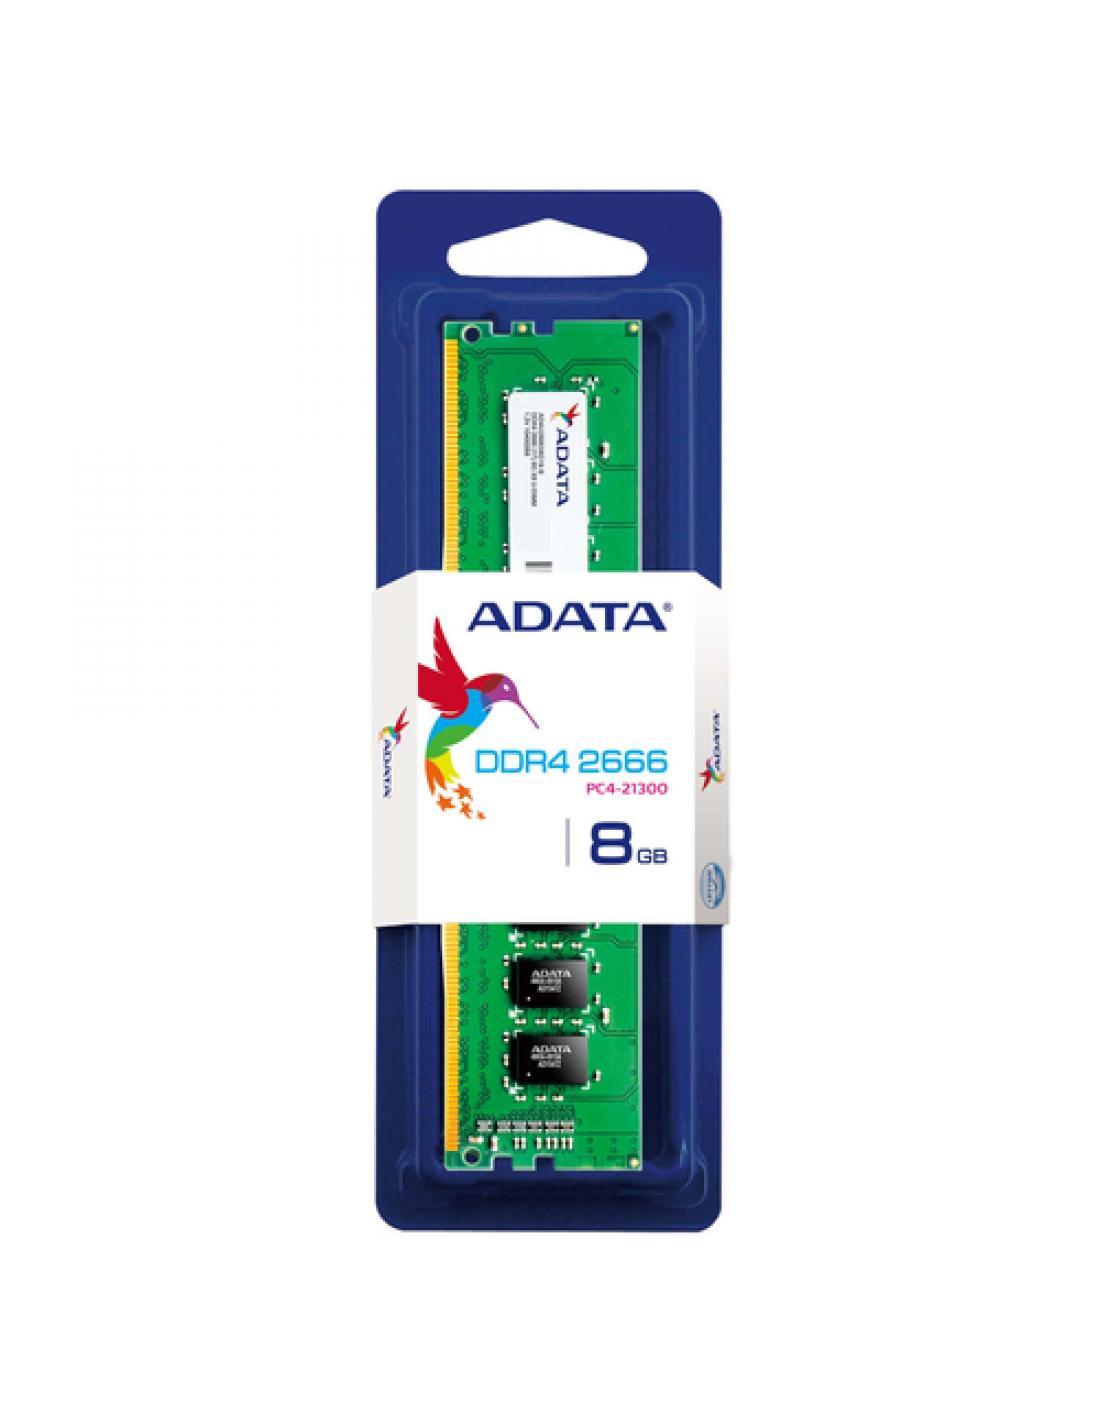 Memoria Adata Ddr4 2666 Mhz 8gb Single T